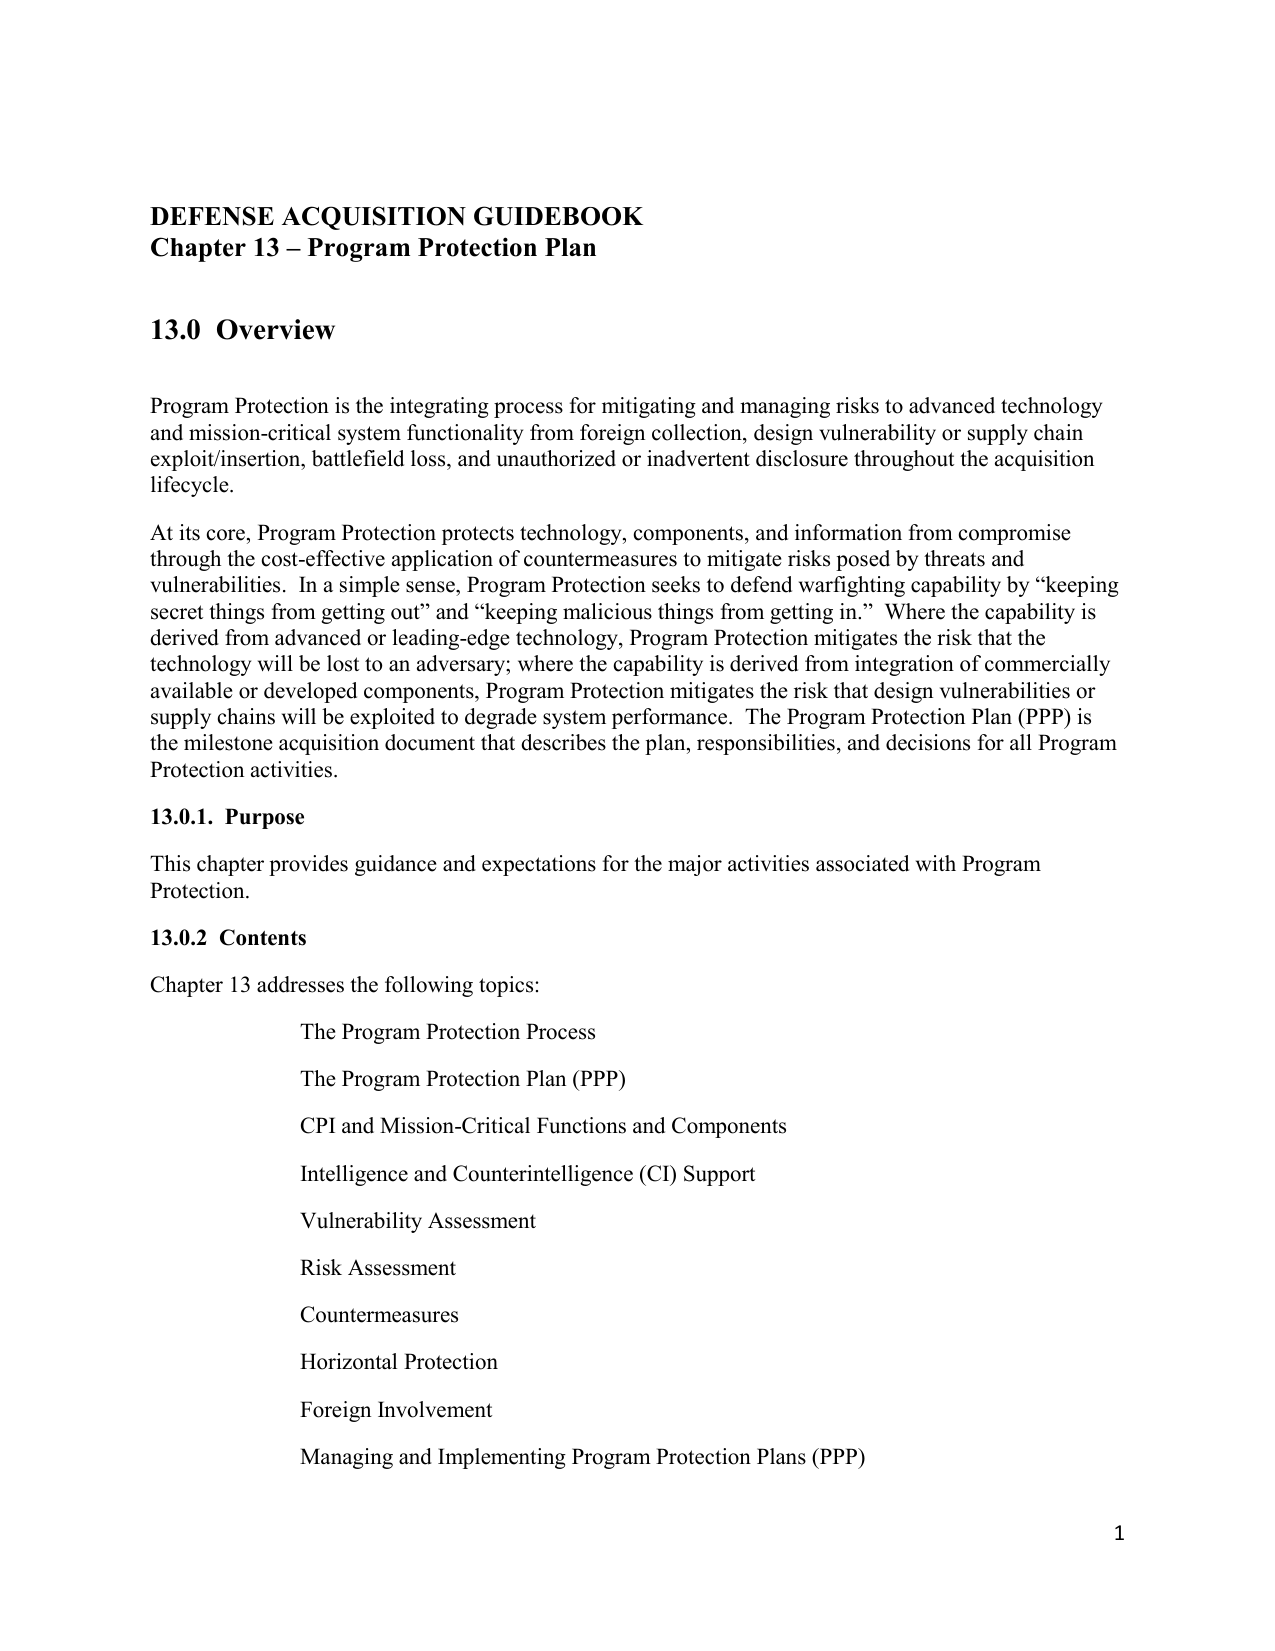 Defense Acquisition Guidebook | InsideDefense.com